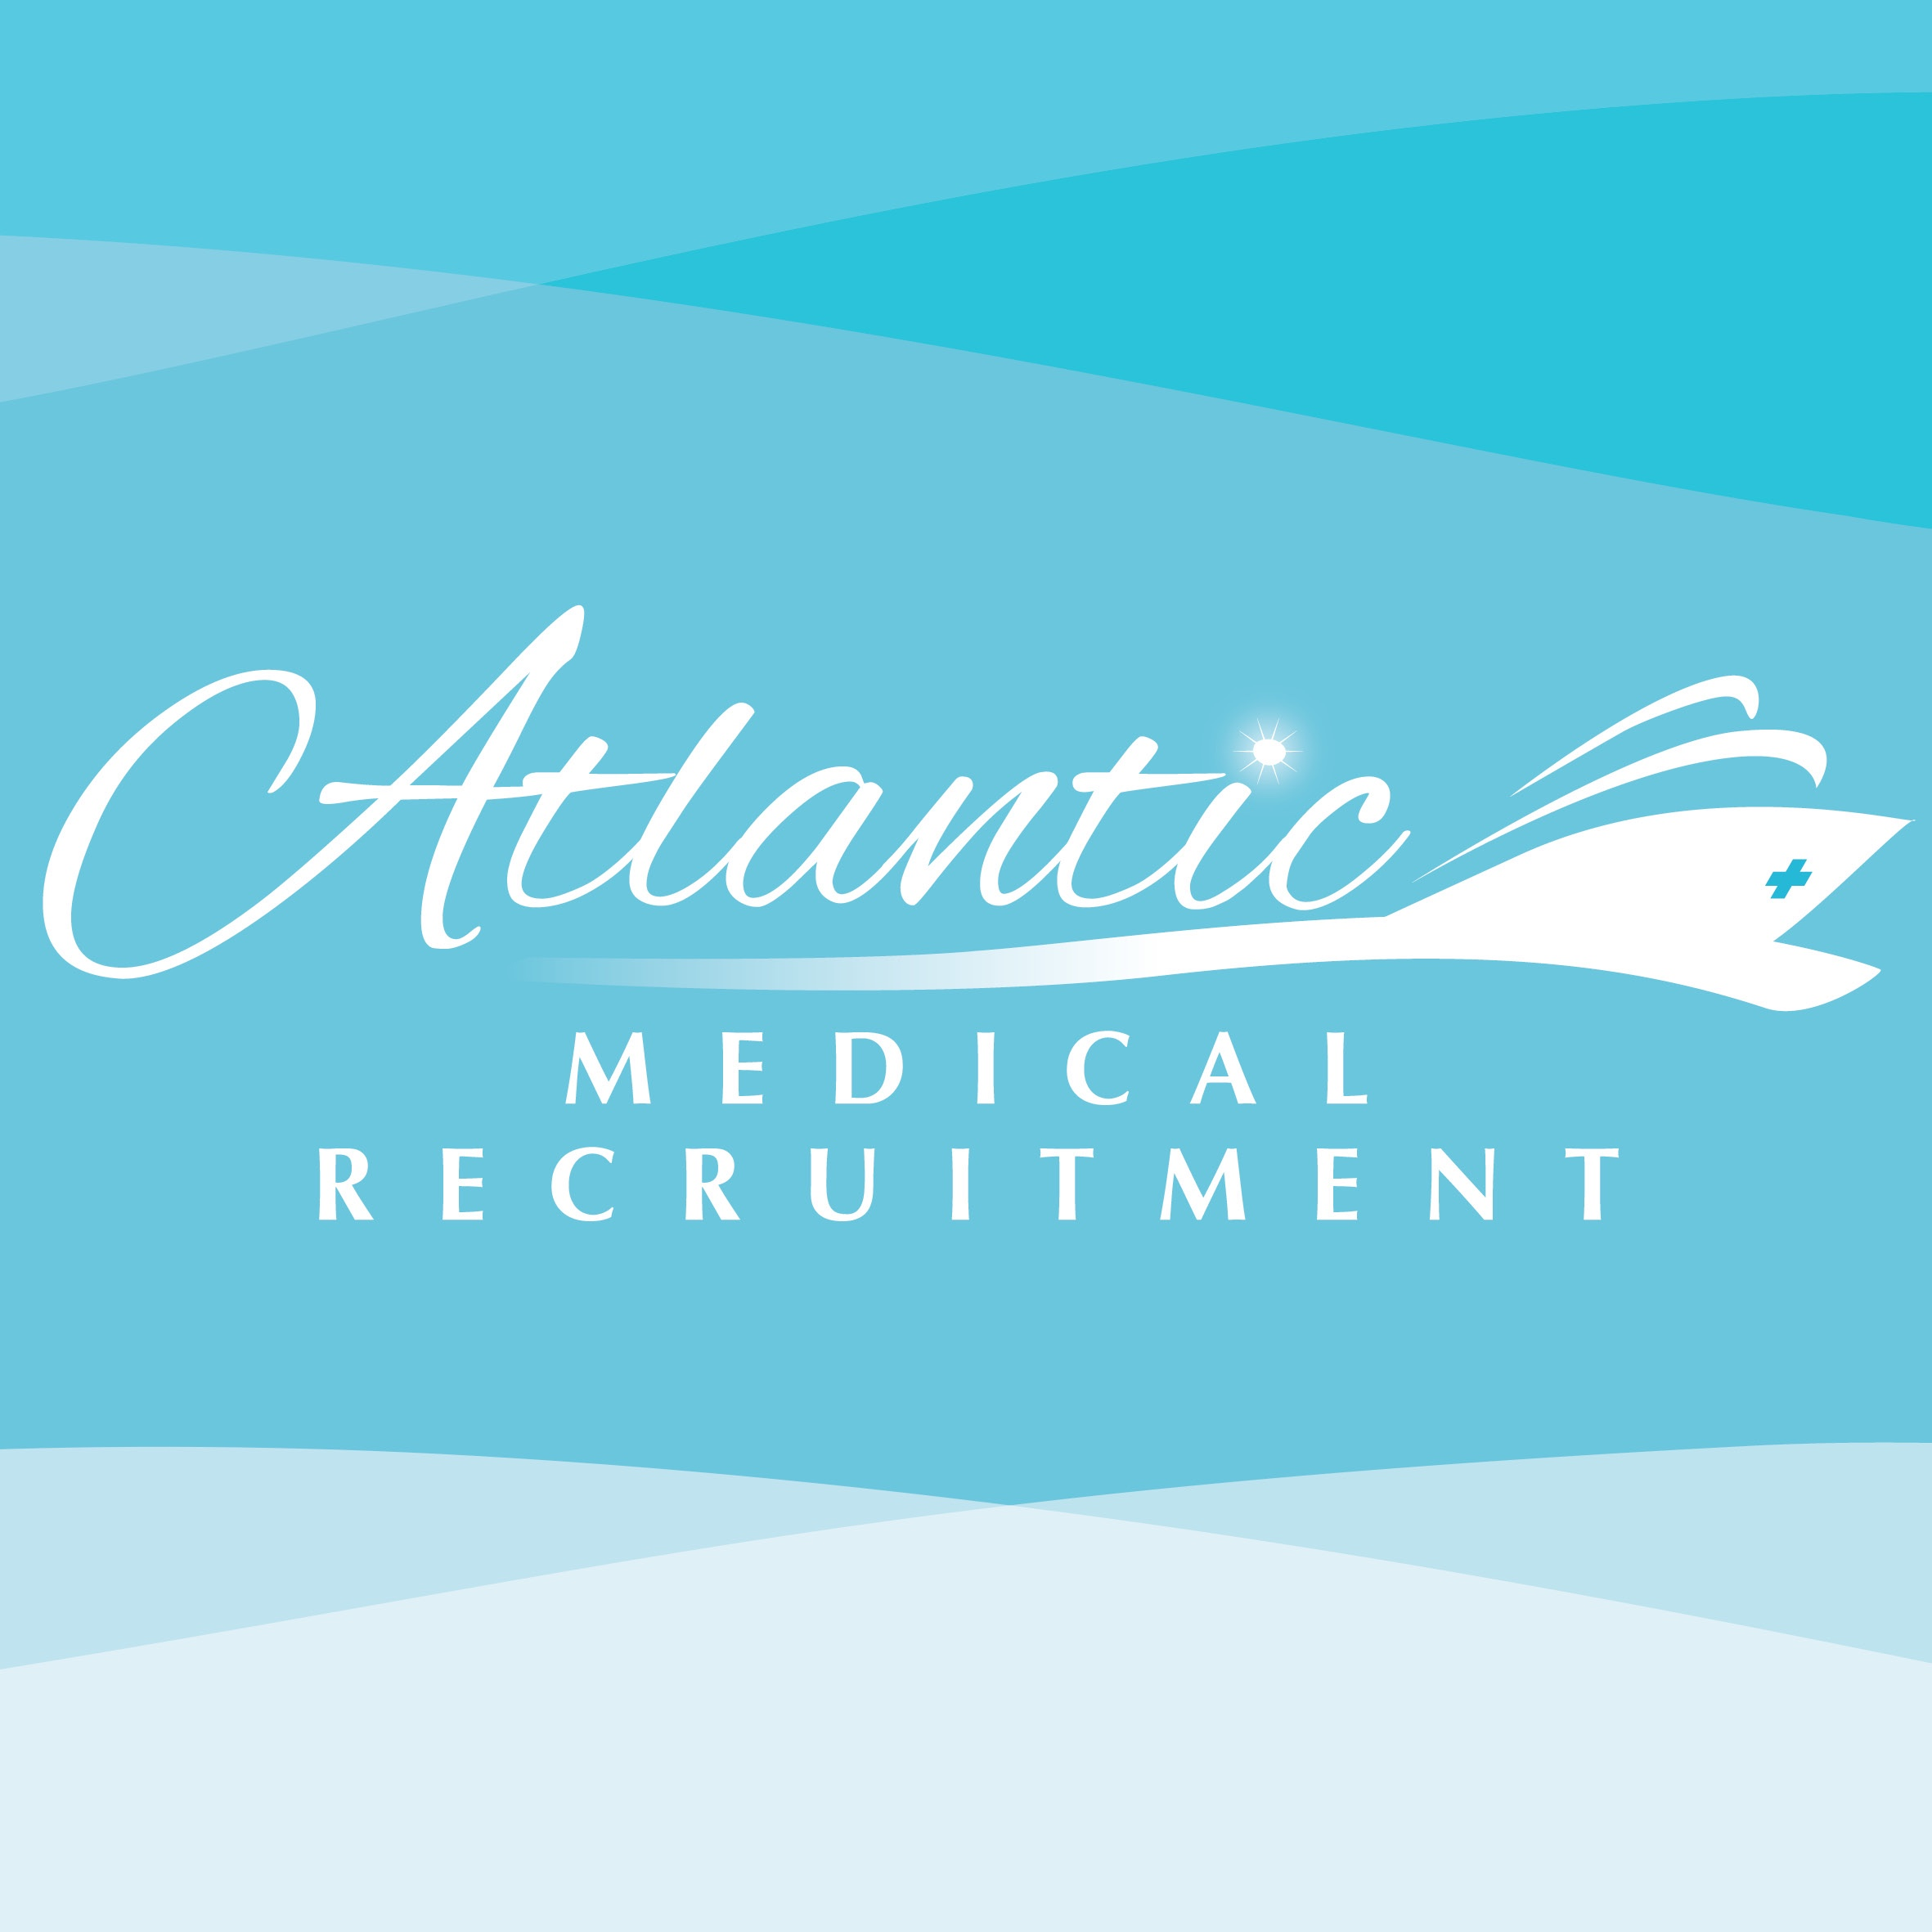 Atlantic Medical Recruitment